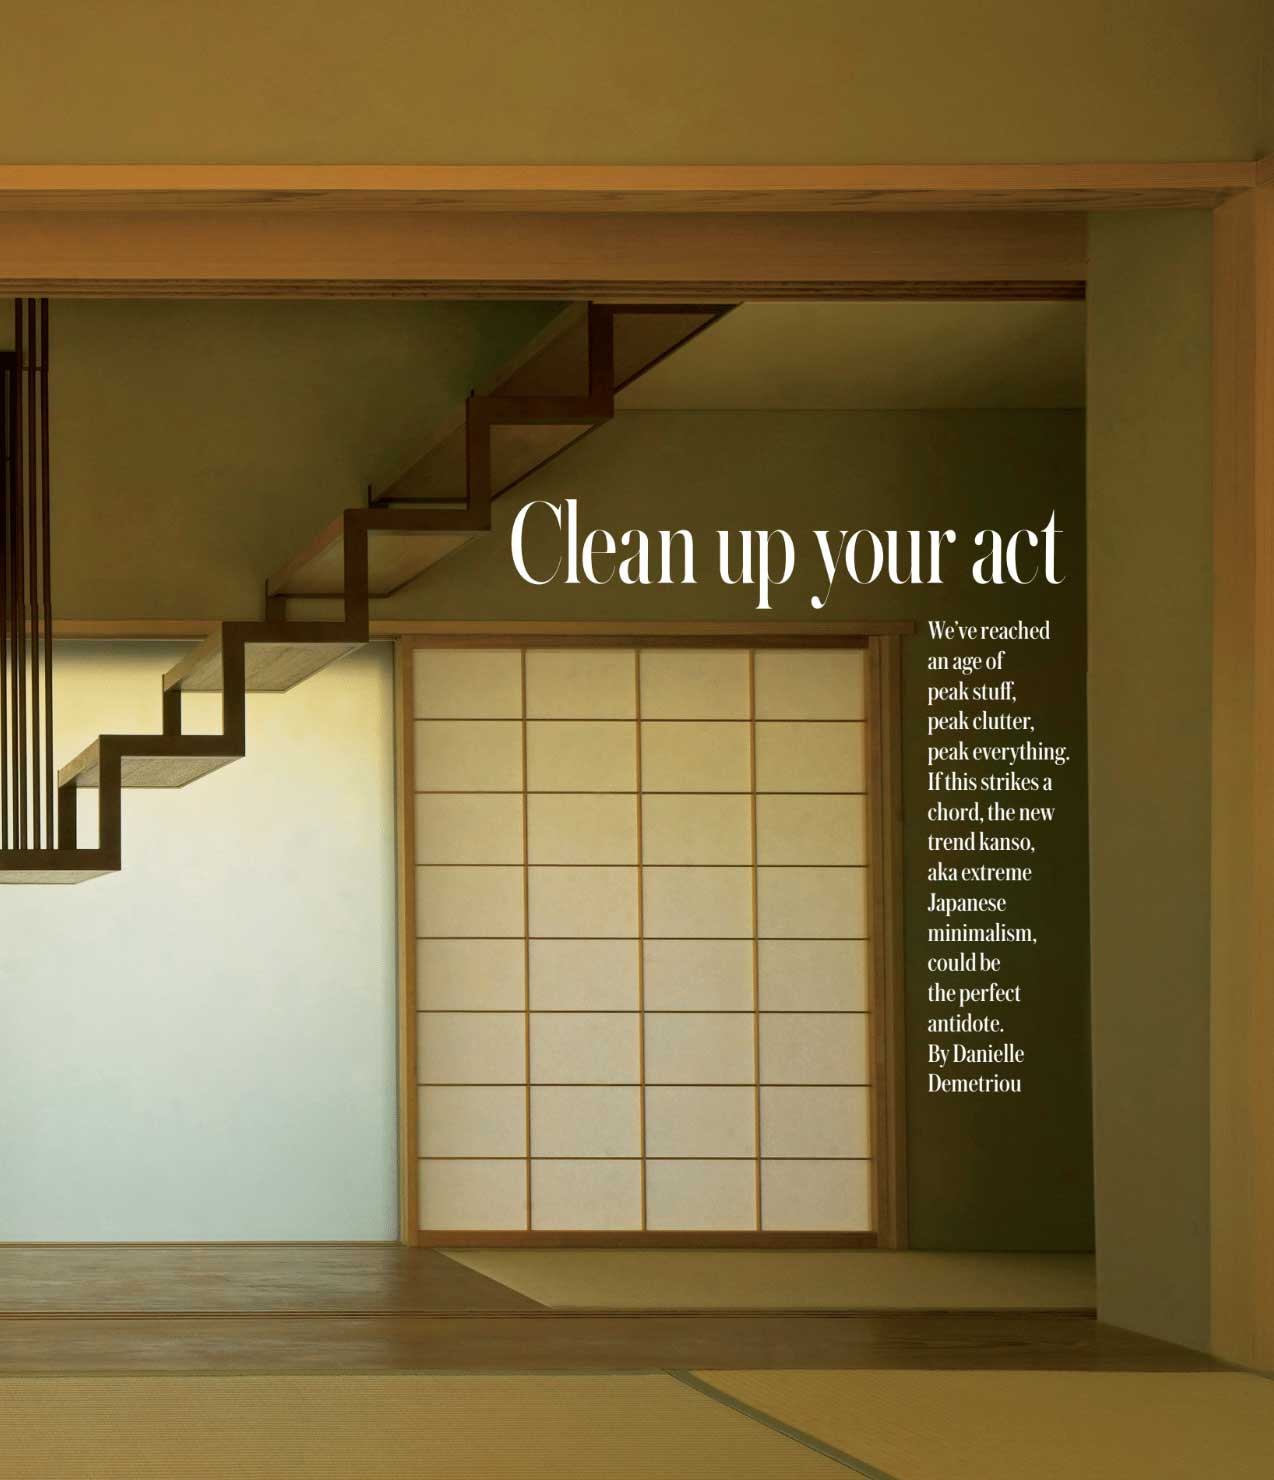 05 Japanese minimalism.jpg